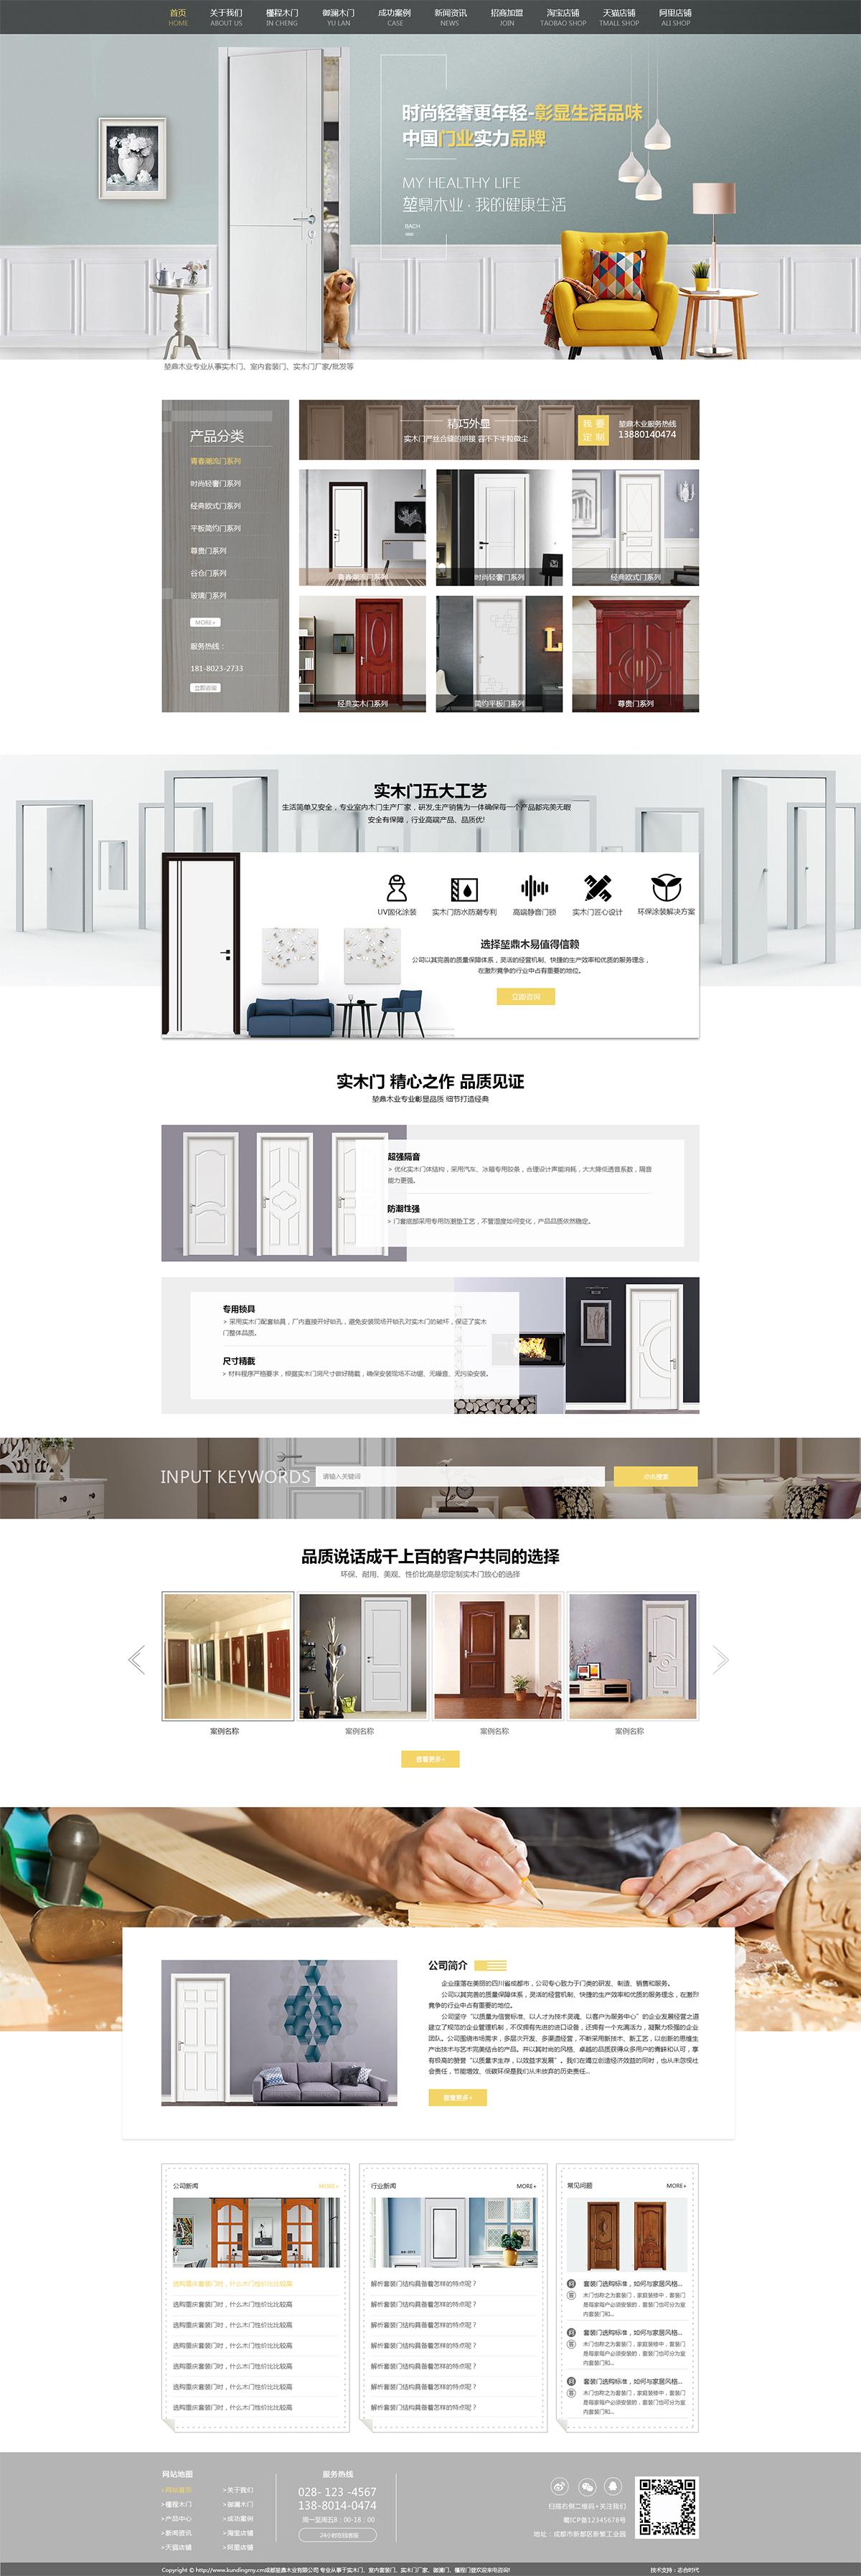 堃鼎木业网站建设